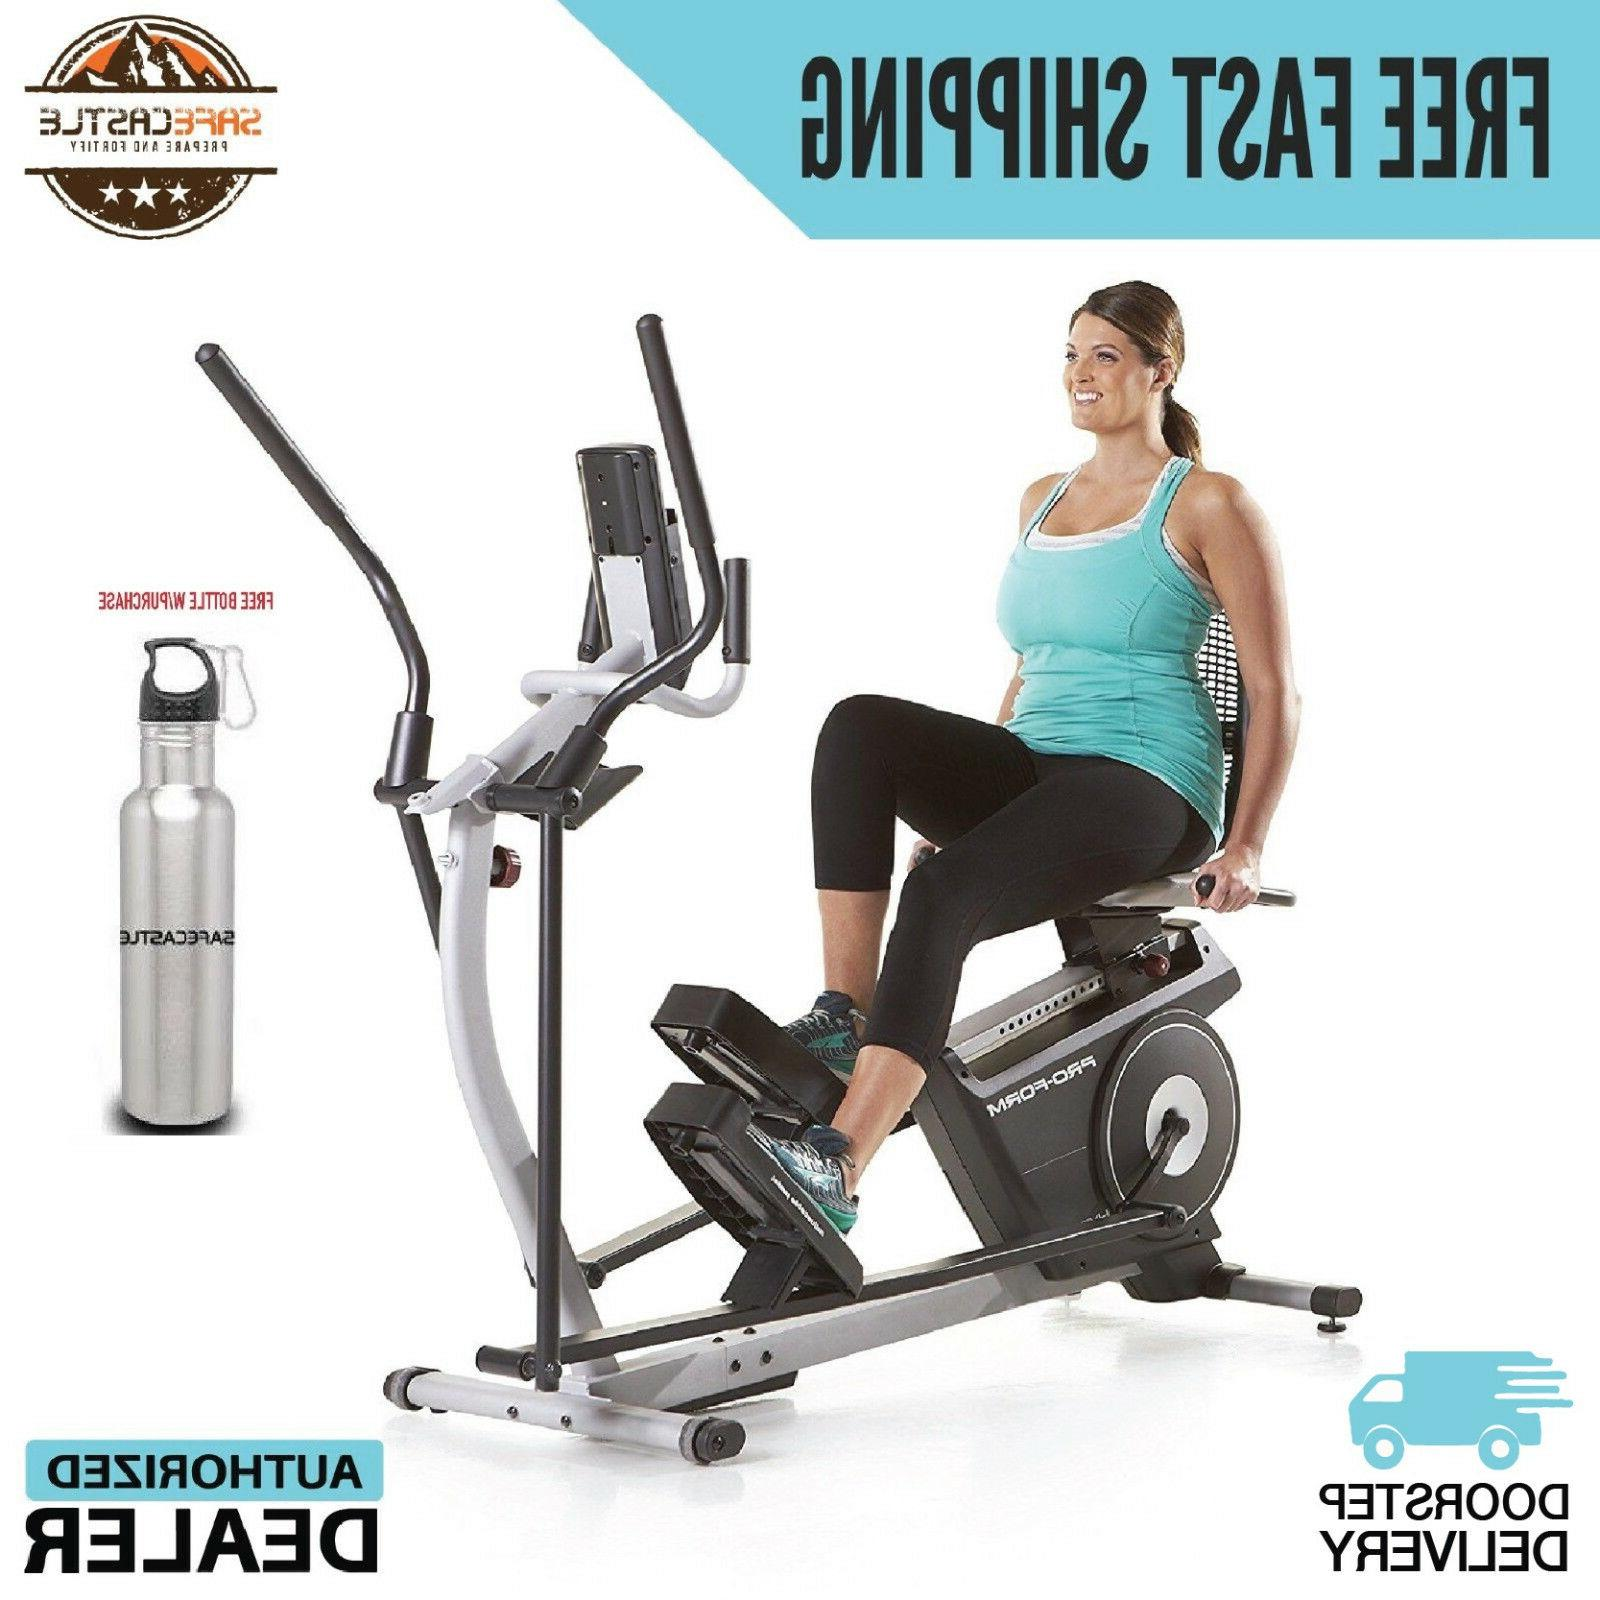 new hybrid trainer elliptical cardio exercise machine